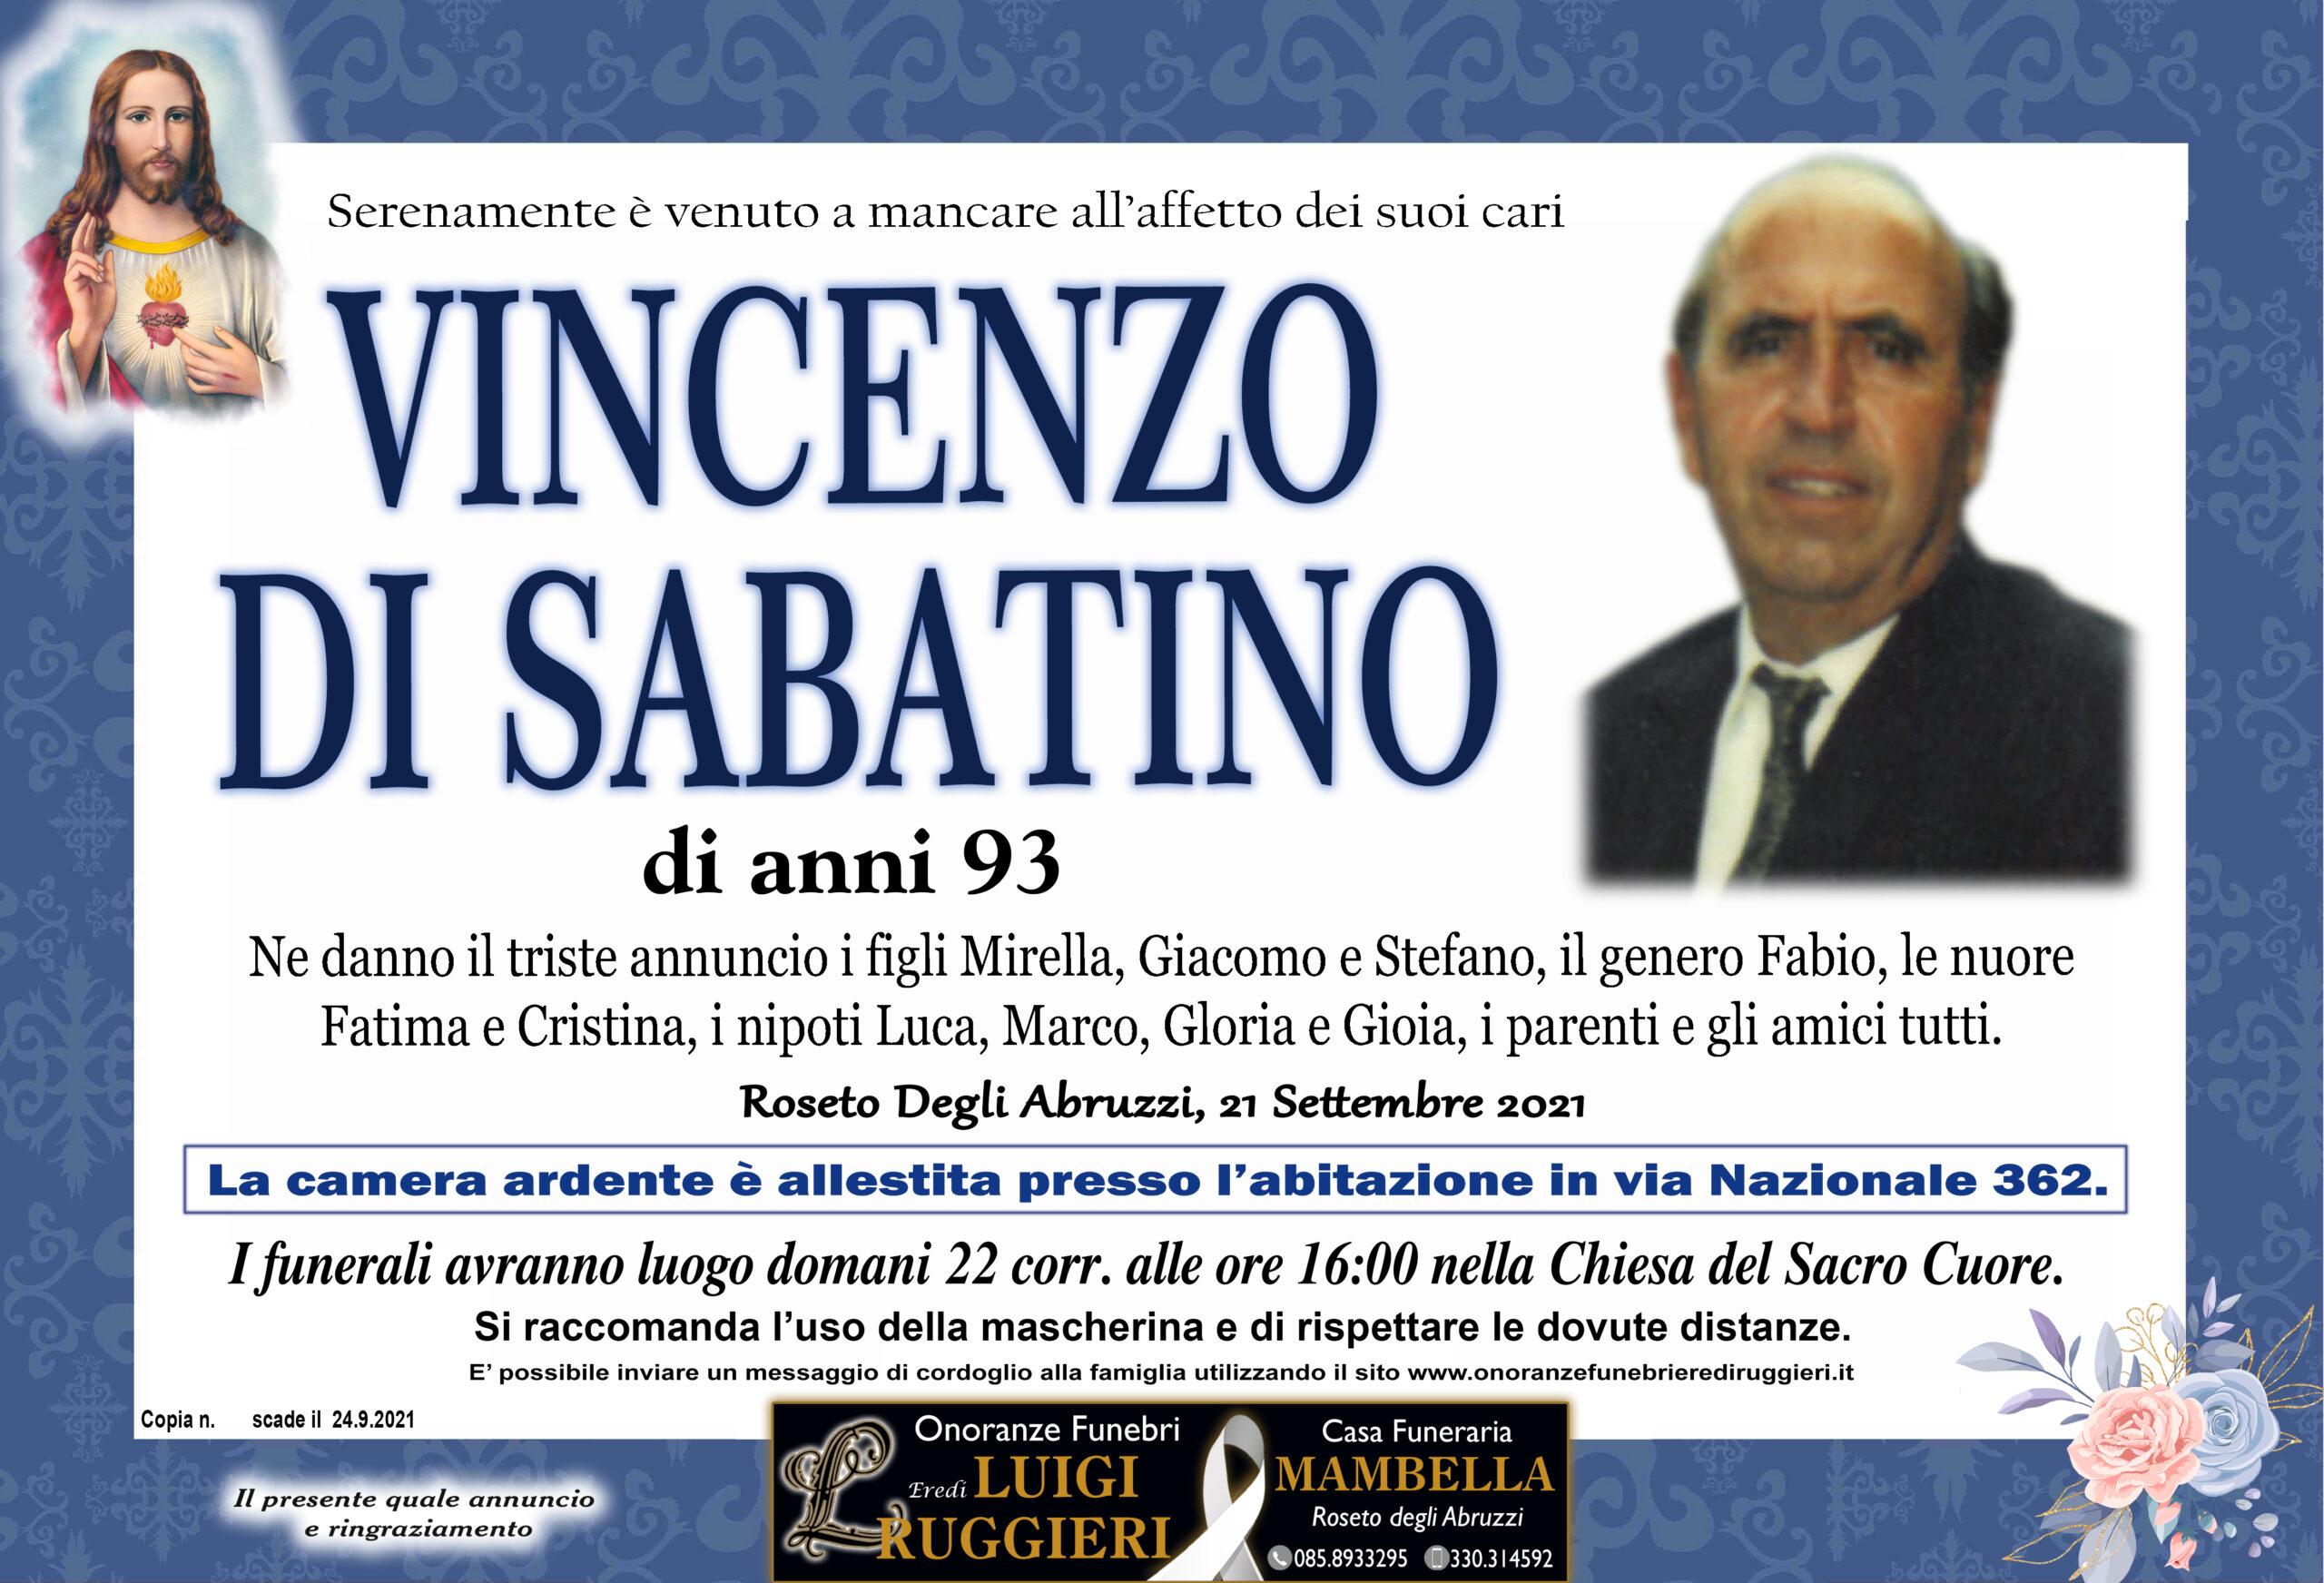 Vincenzo Di Sabatino